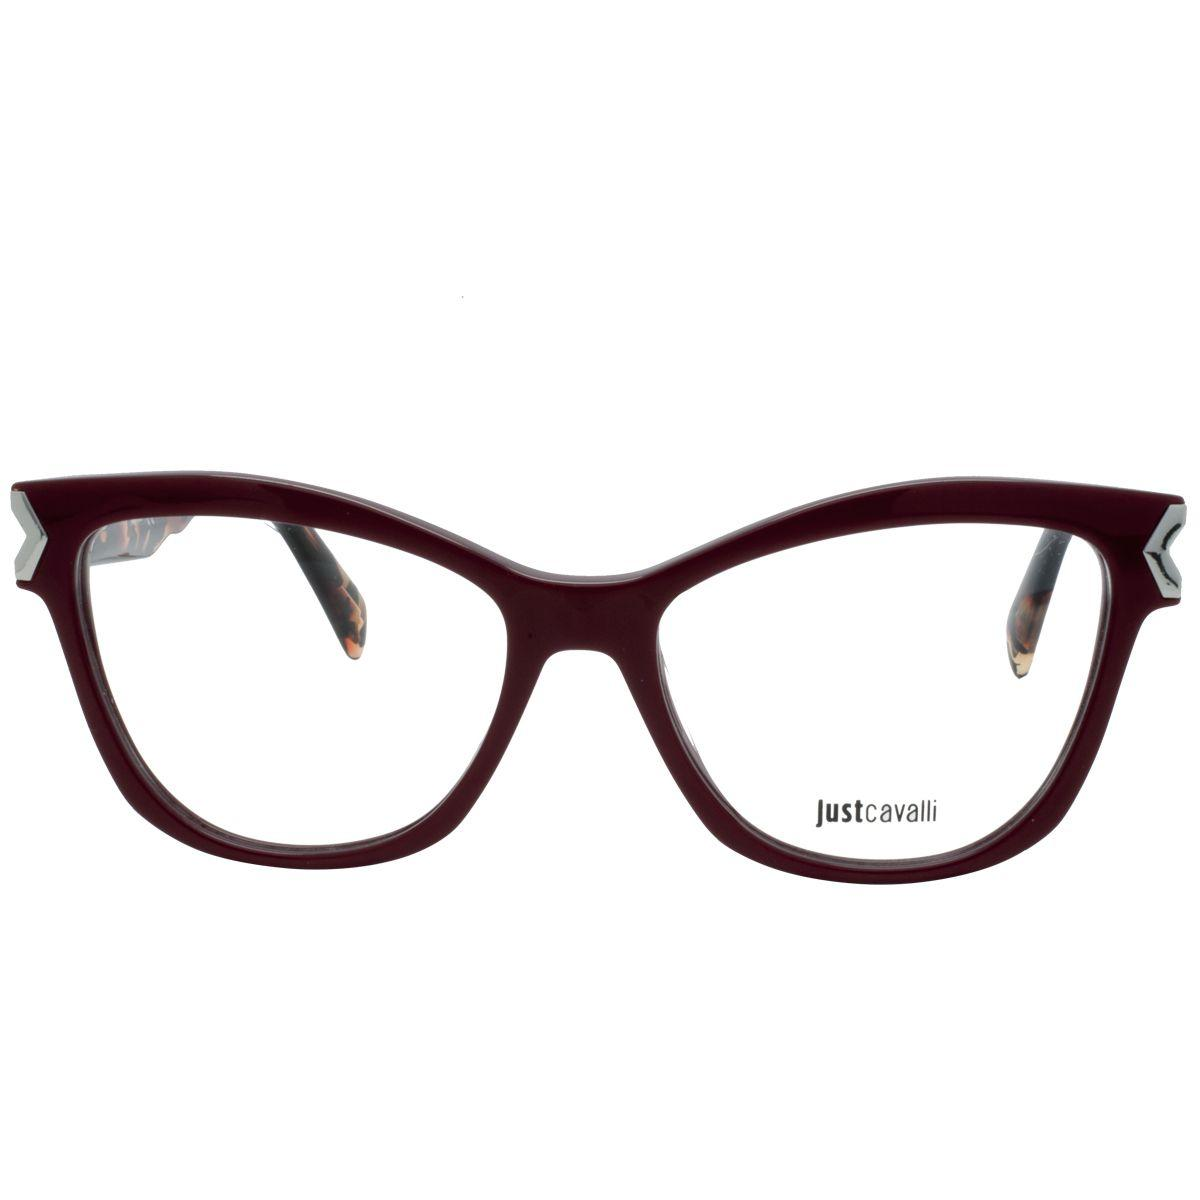 1b532400ddccb Óculos de Grau Just Cavalli Feminino JC0807 069 - Acetato Bordô R  554